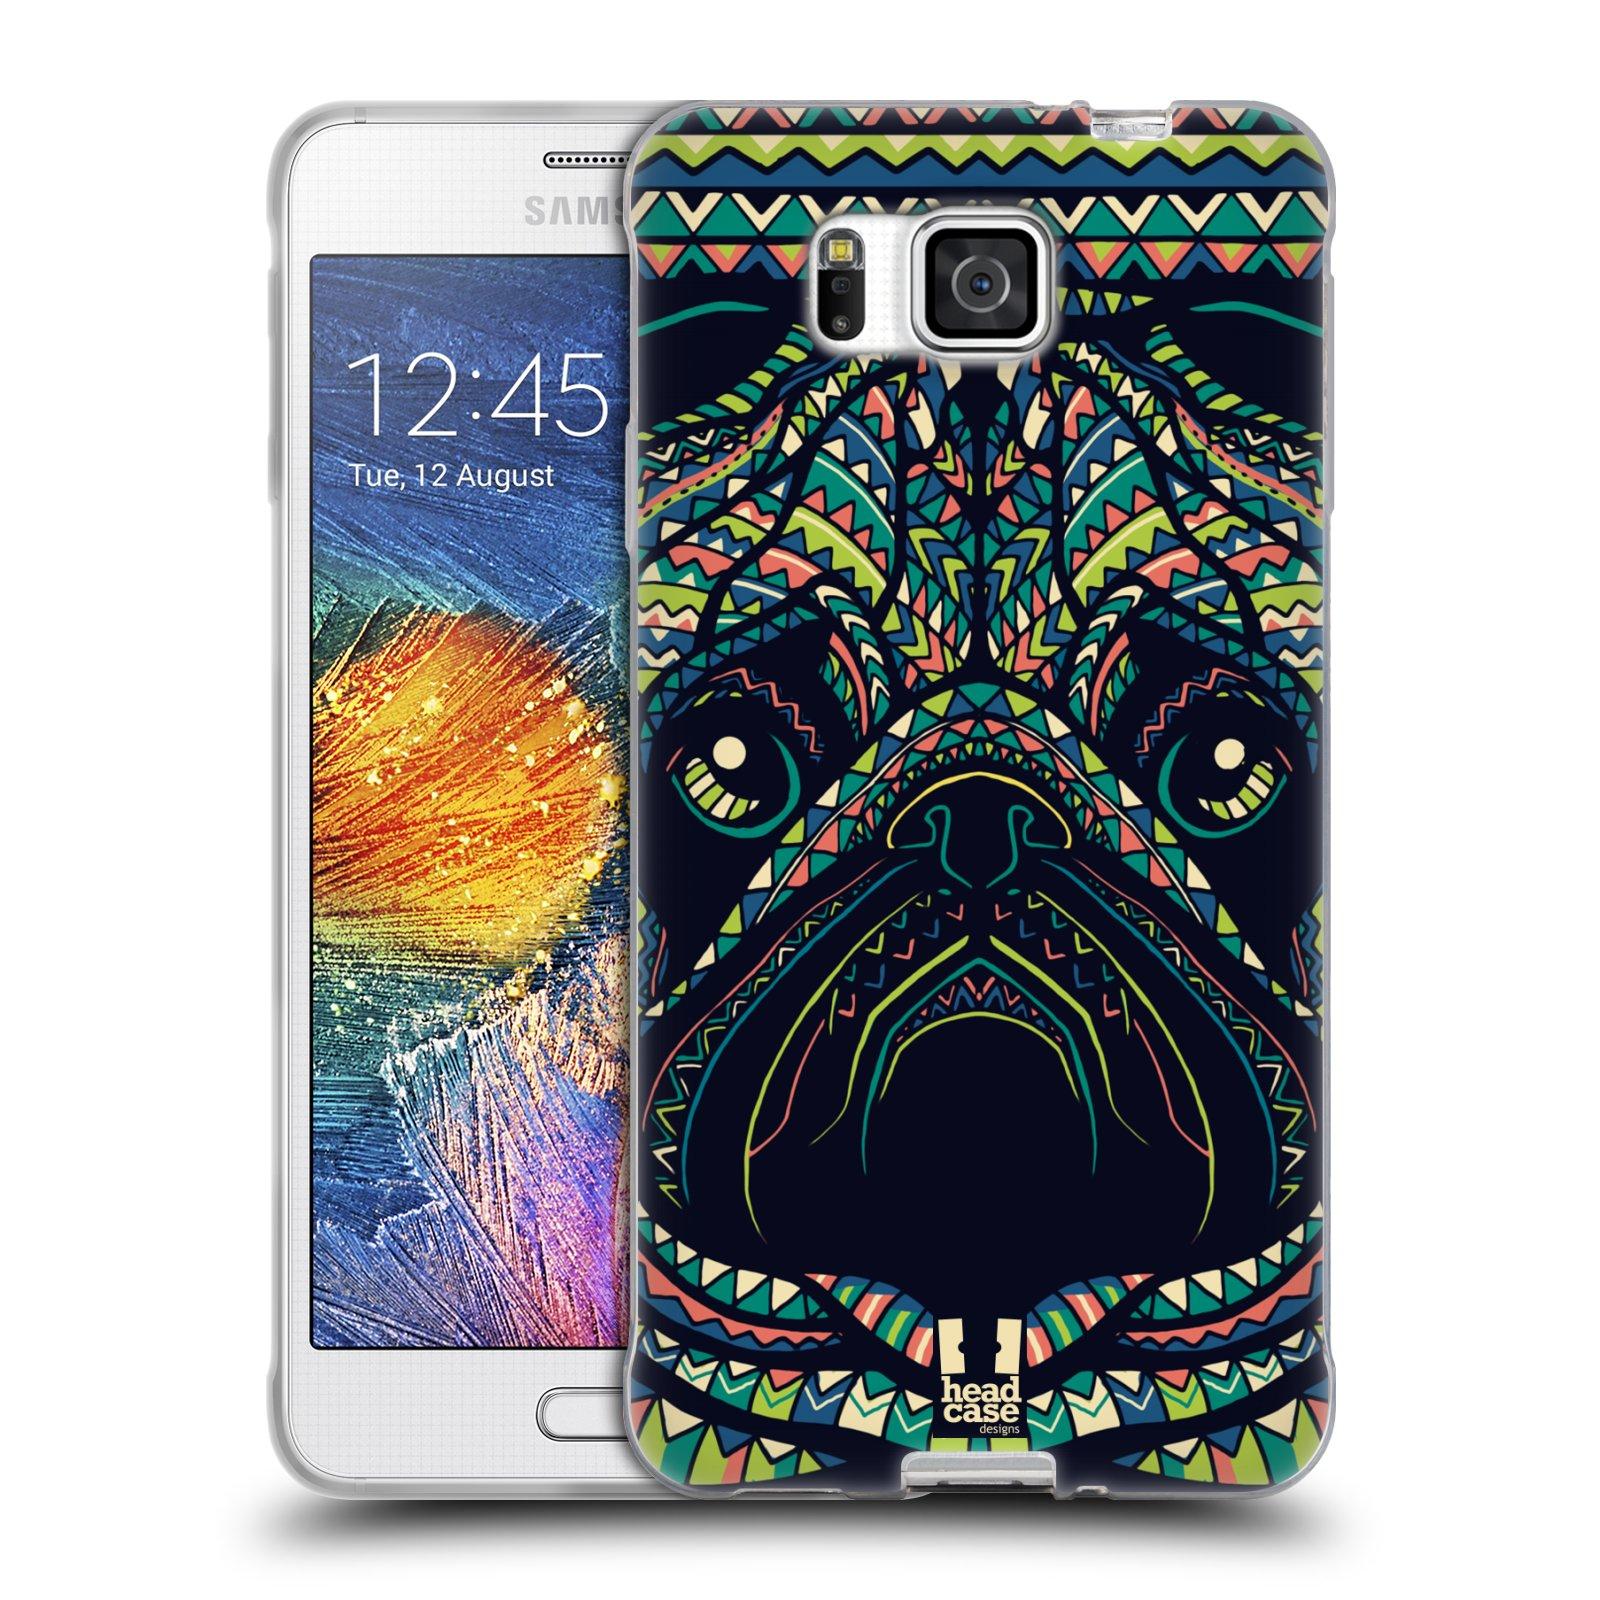 HEAD CASE silikonový obal na mobil Samsung Galaxy ALPHA vzor Aztécký motiv zvíře 3 mopsík